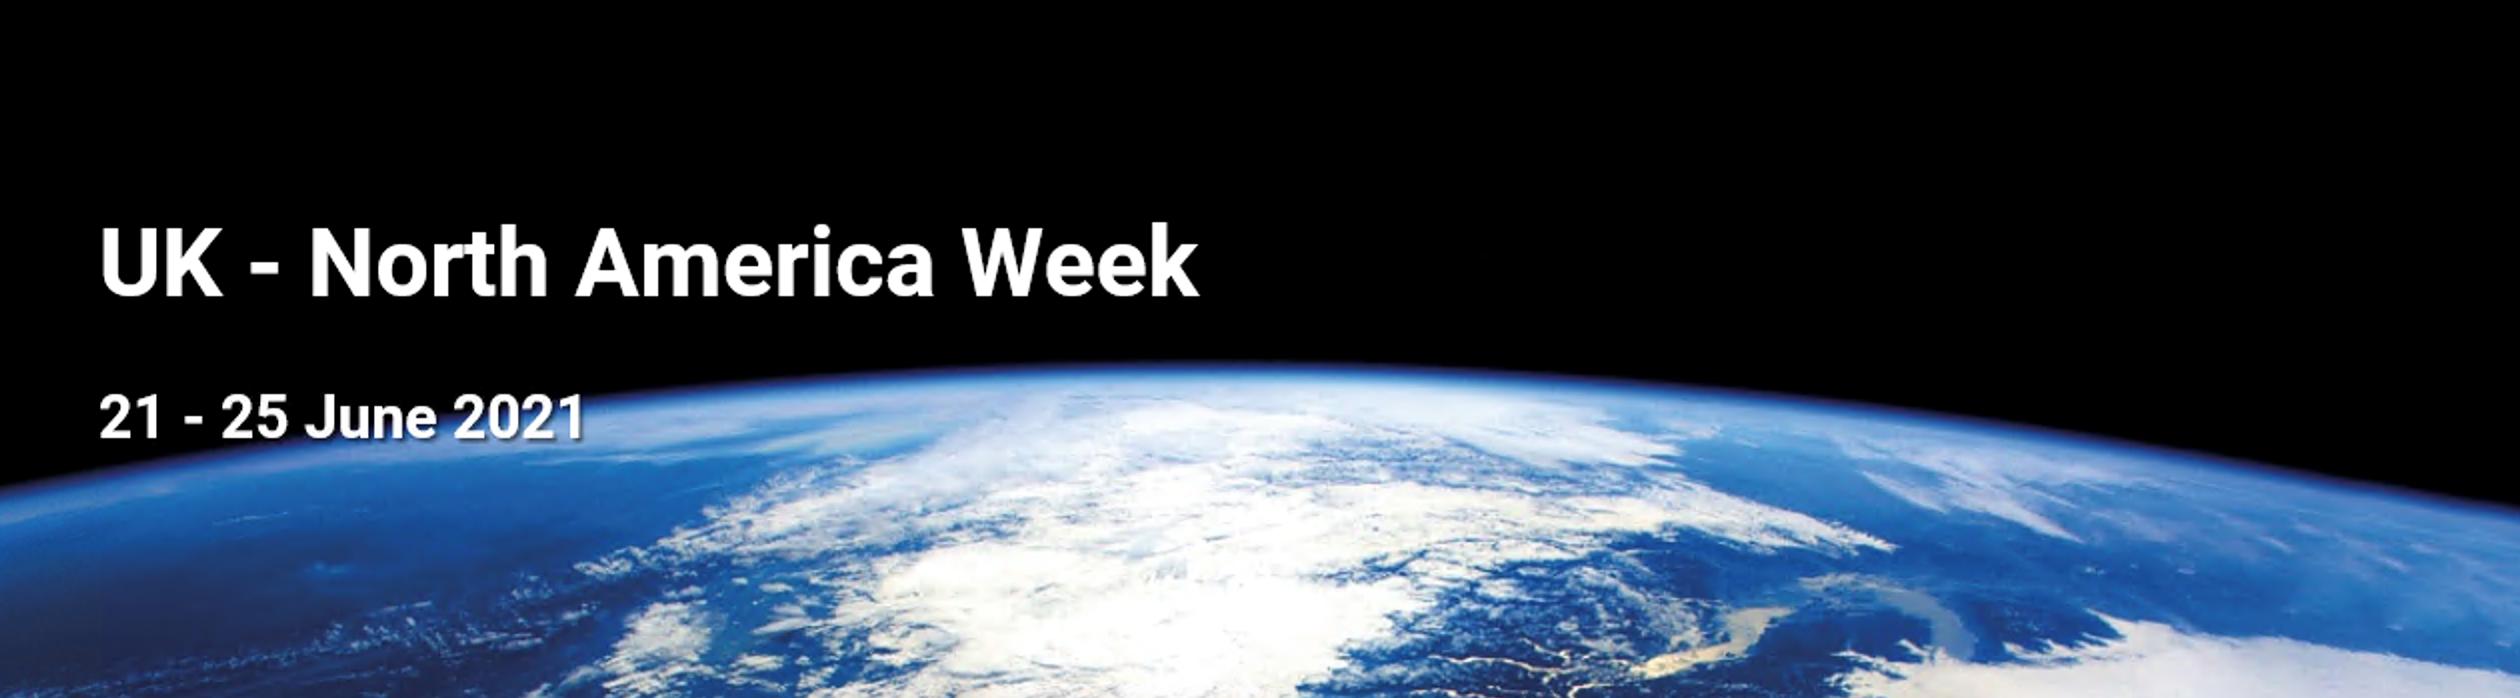 UK – NA Week Image